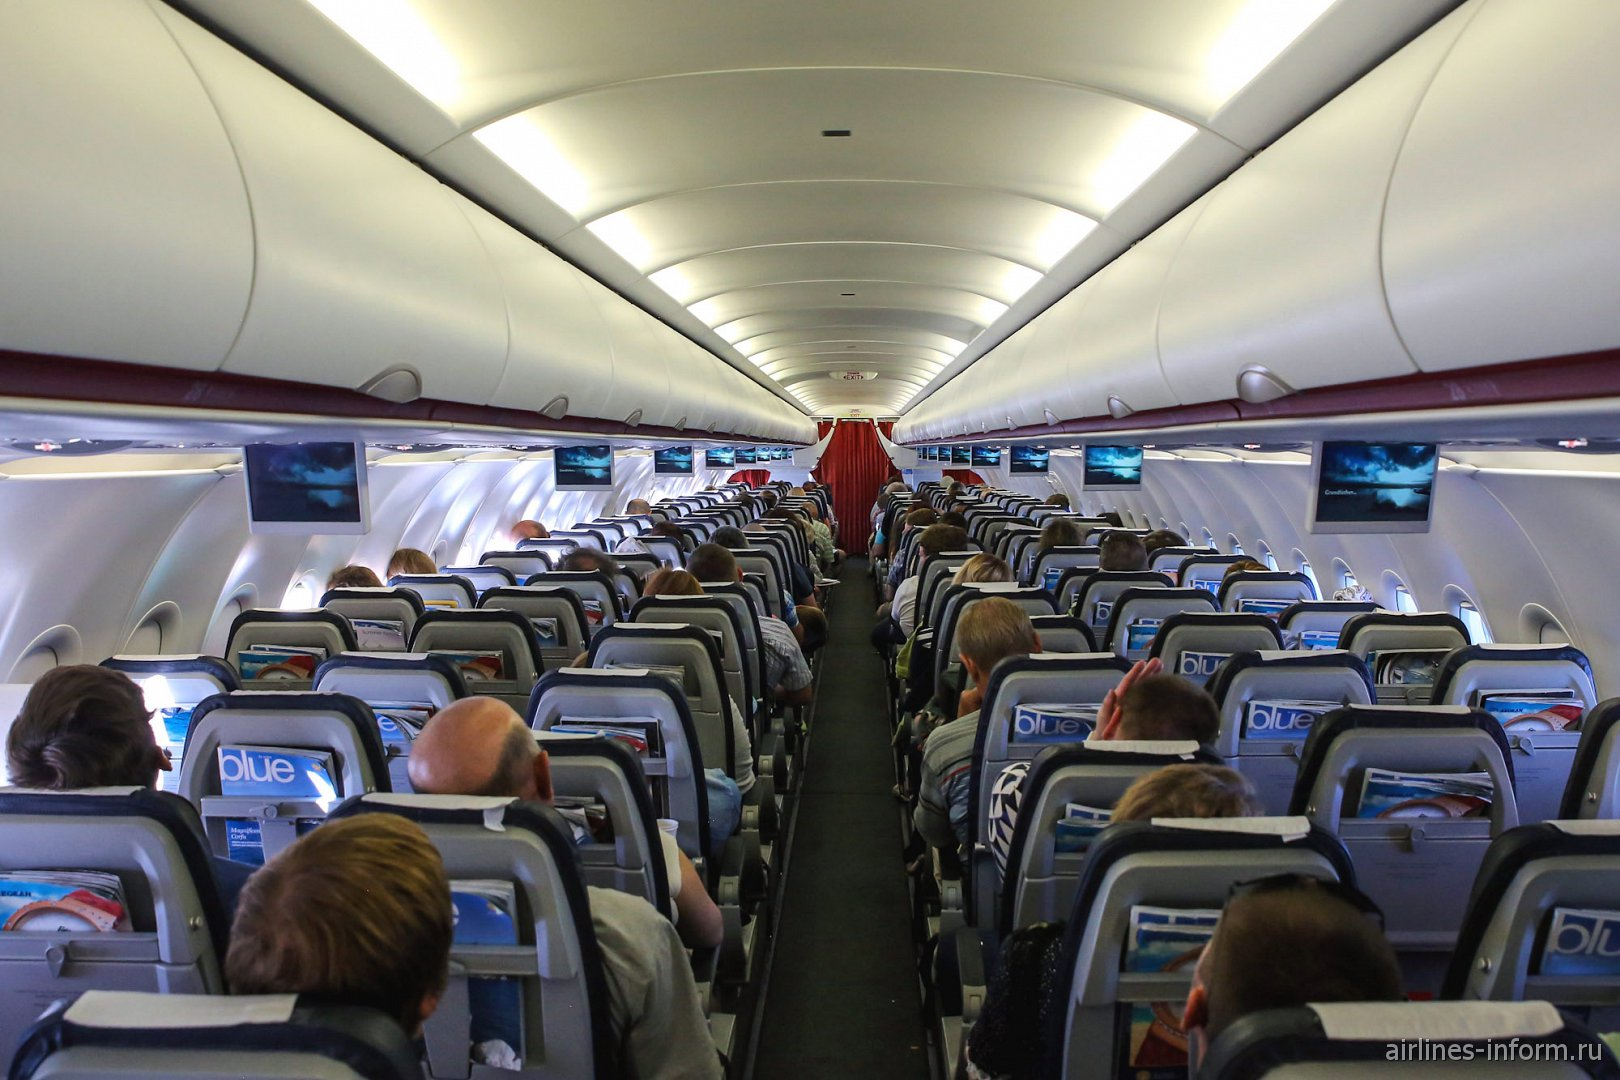 Пассажирский салон самолета Airbus A320 Эгейских авиалиний